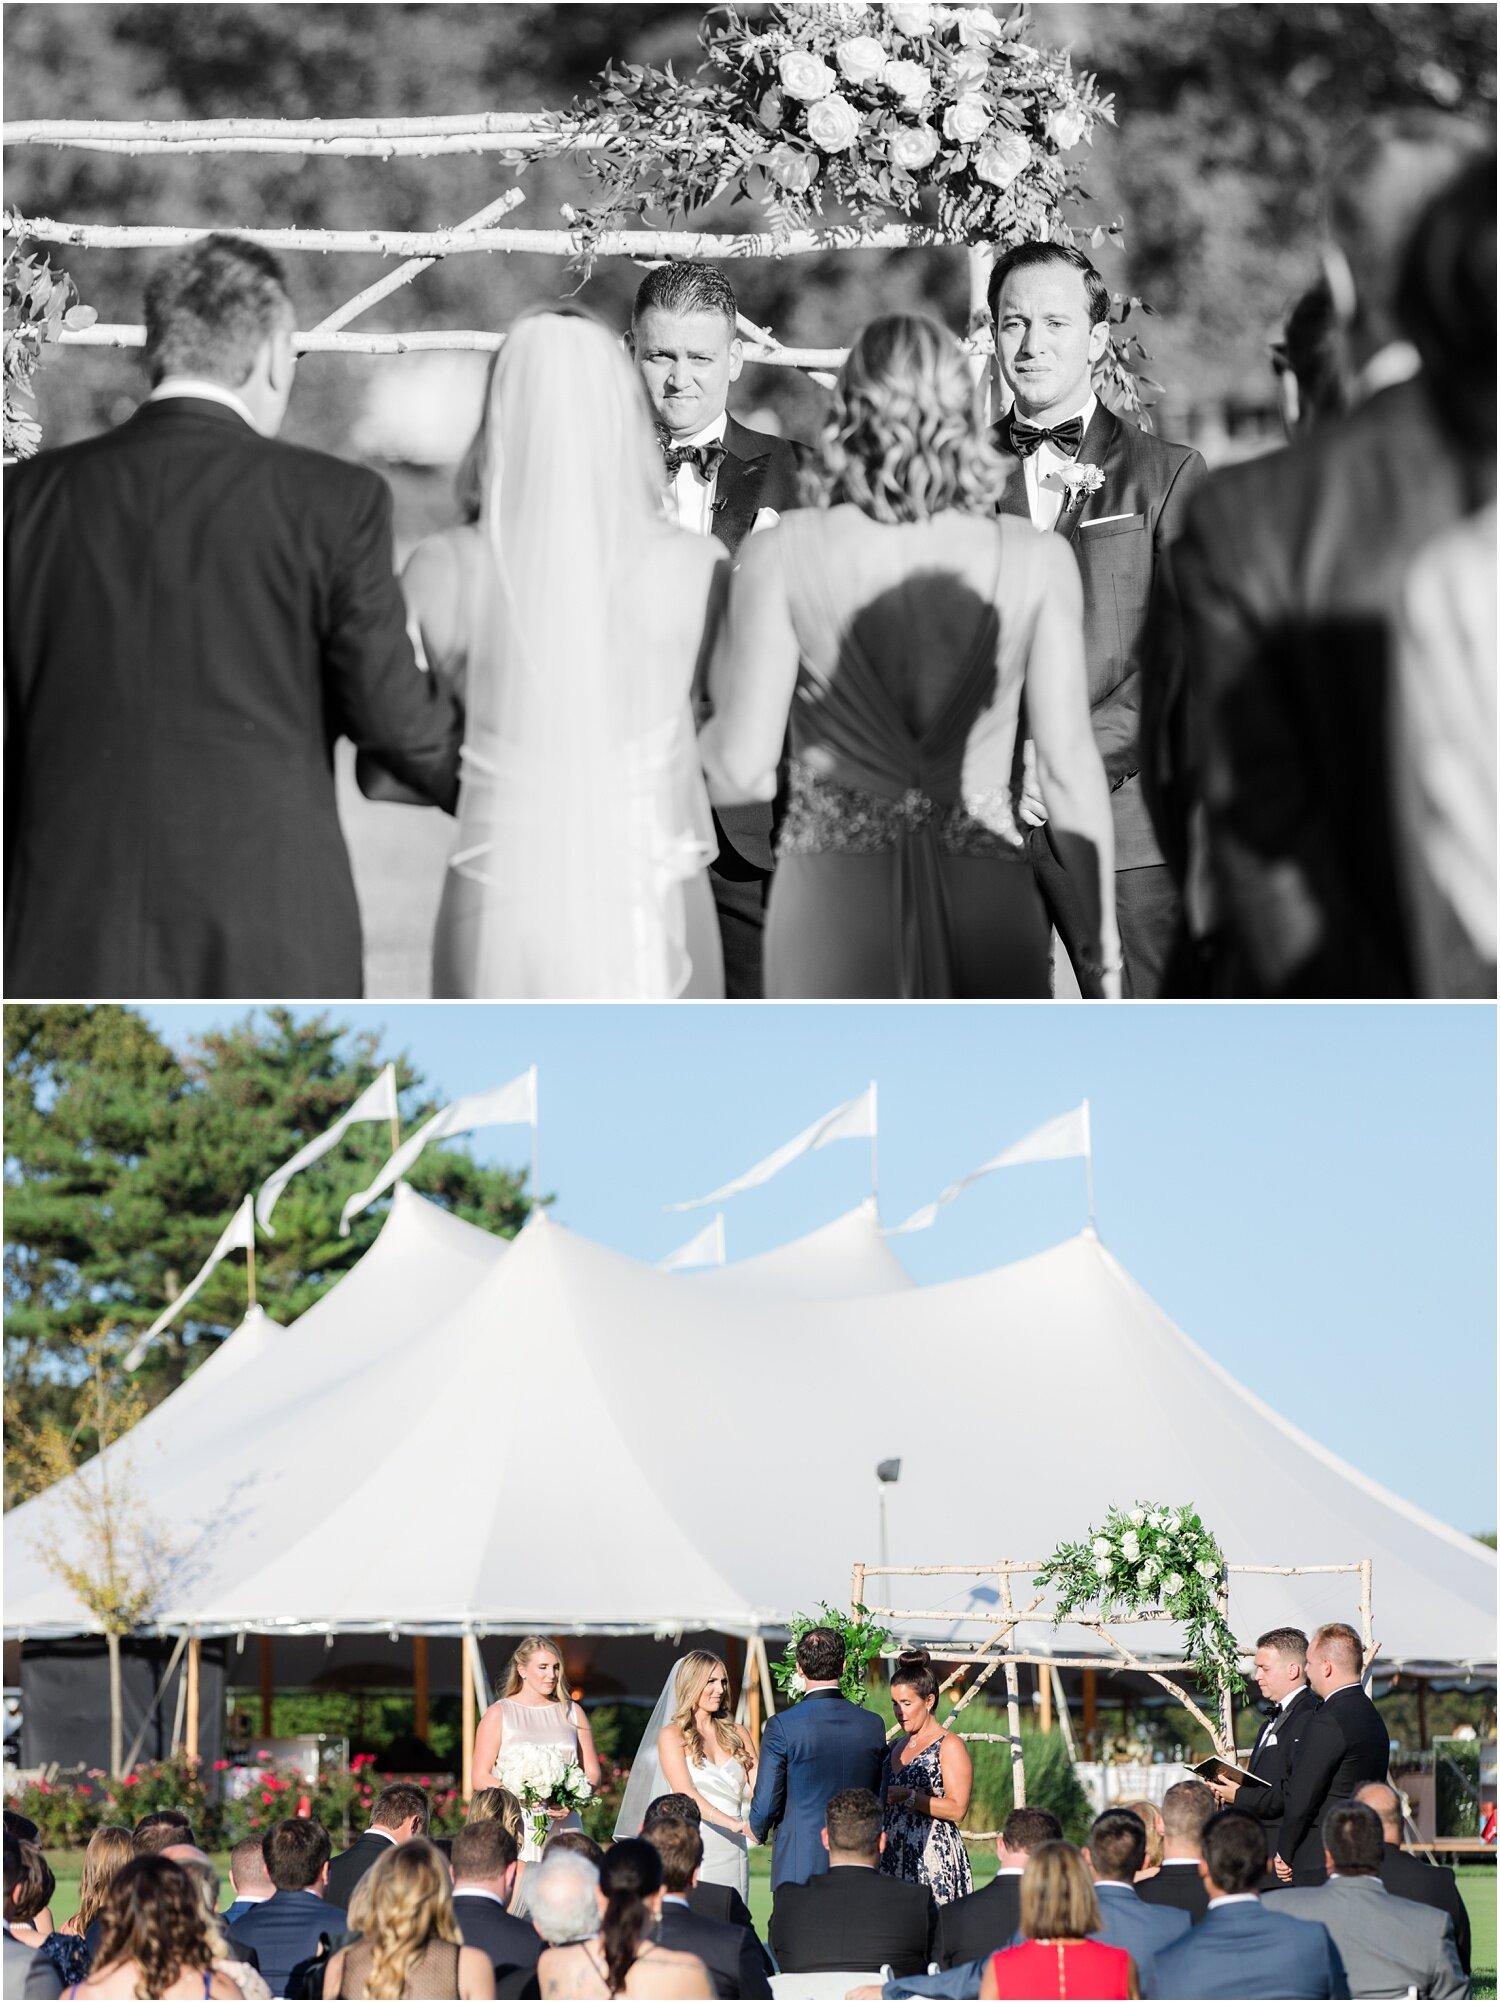 Wedding cermony at Spring Lake Golf Club